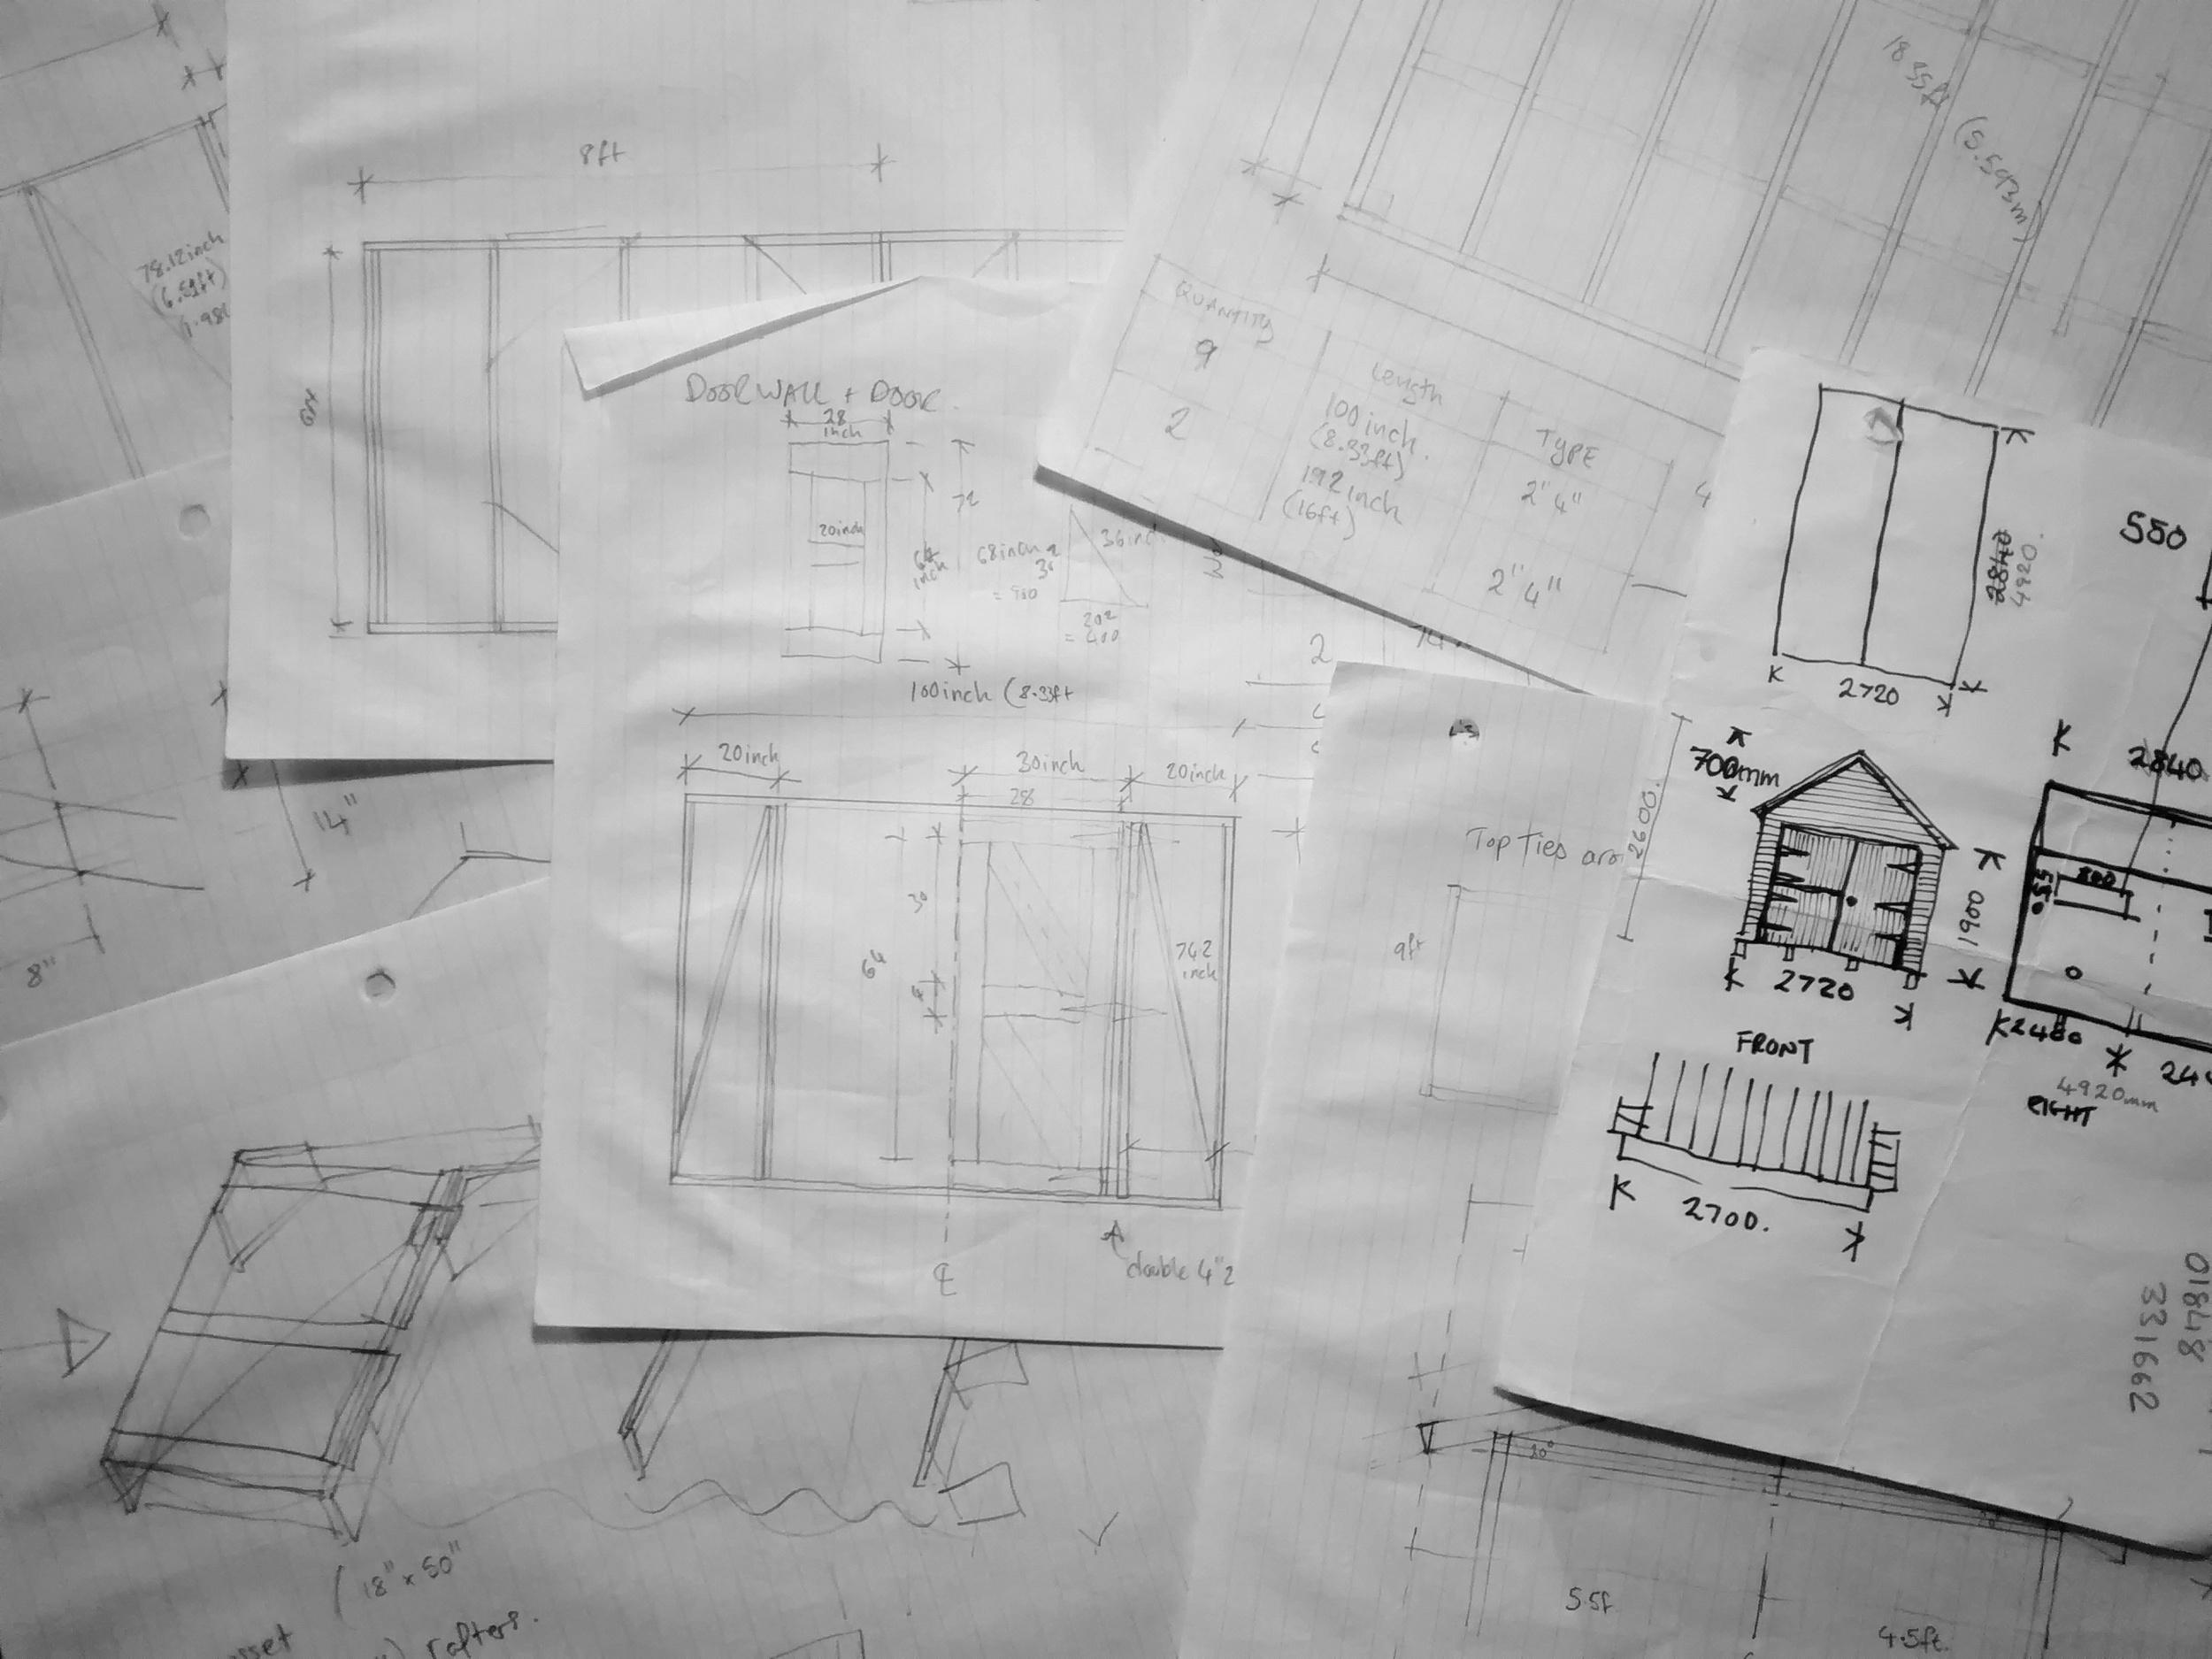 hut sketches